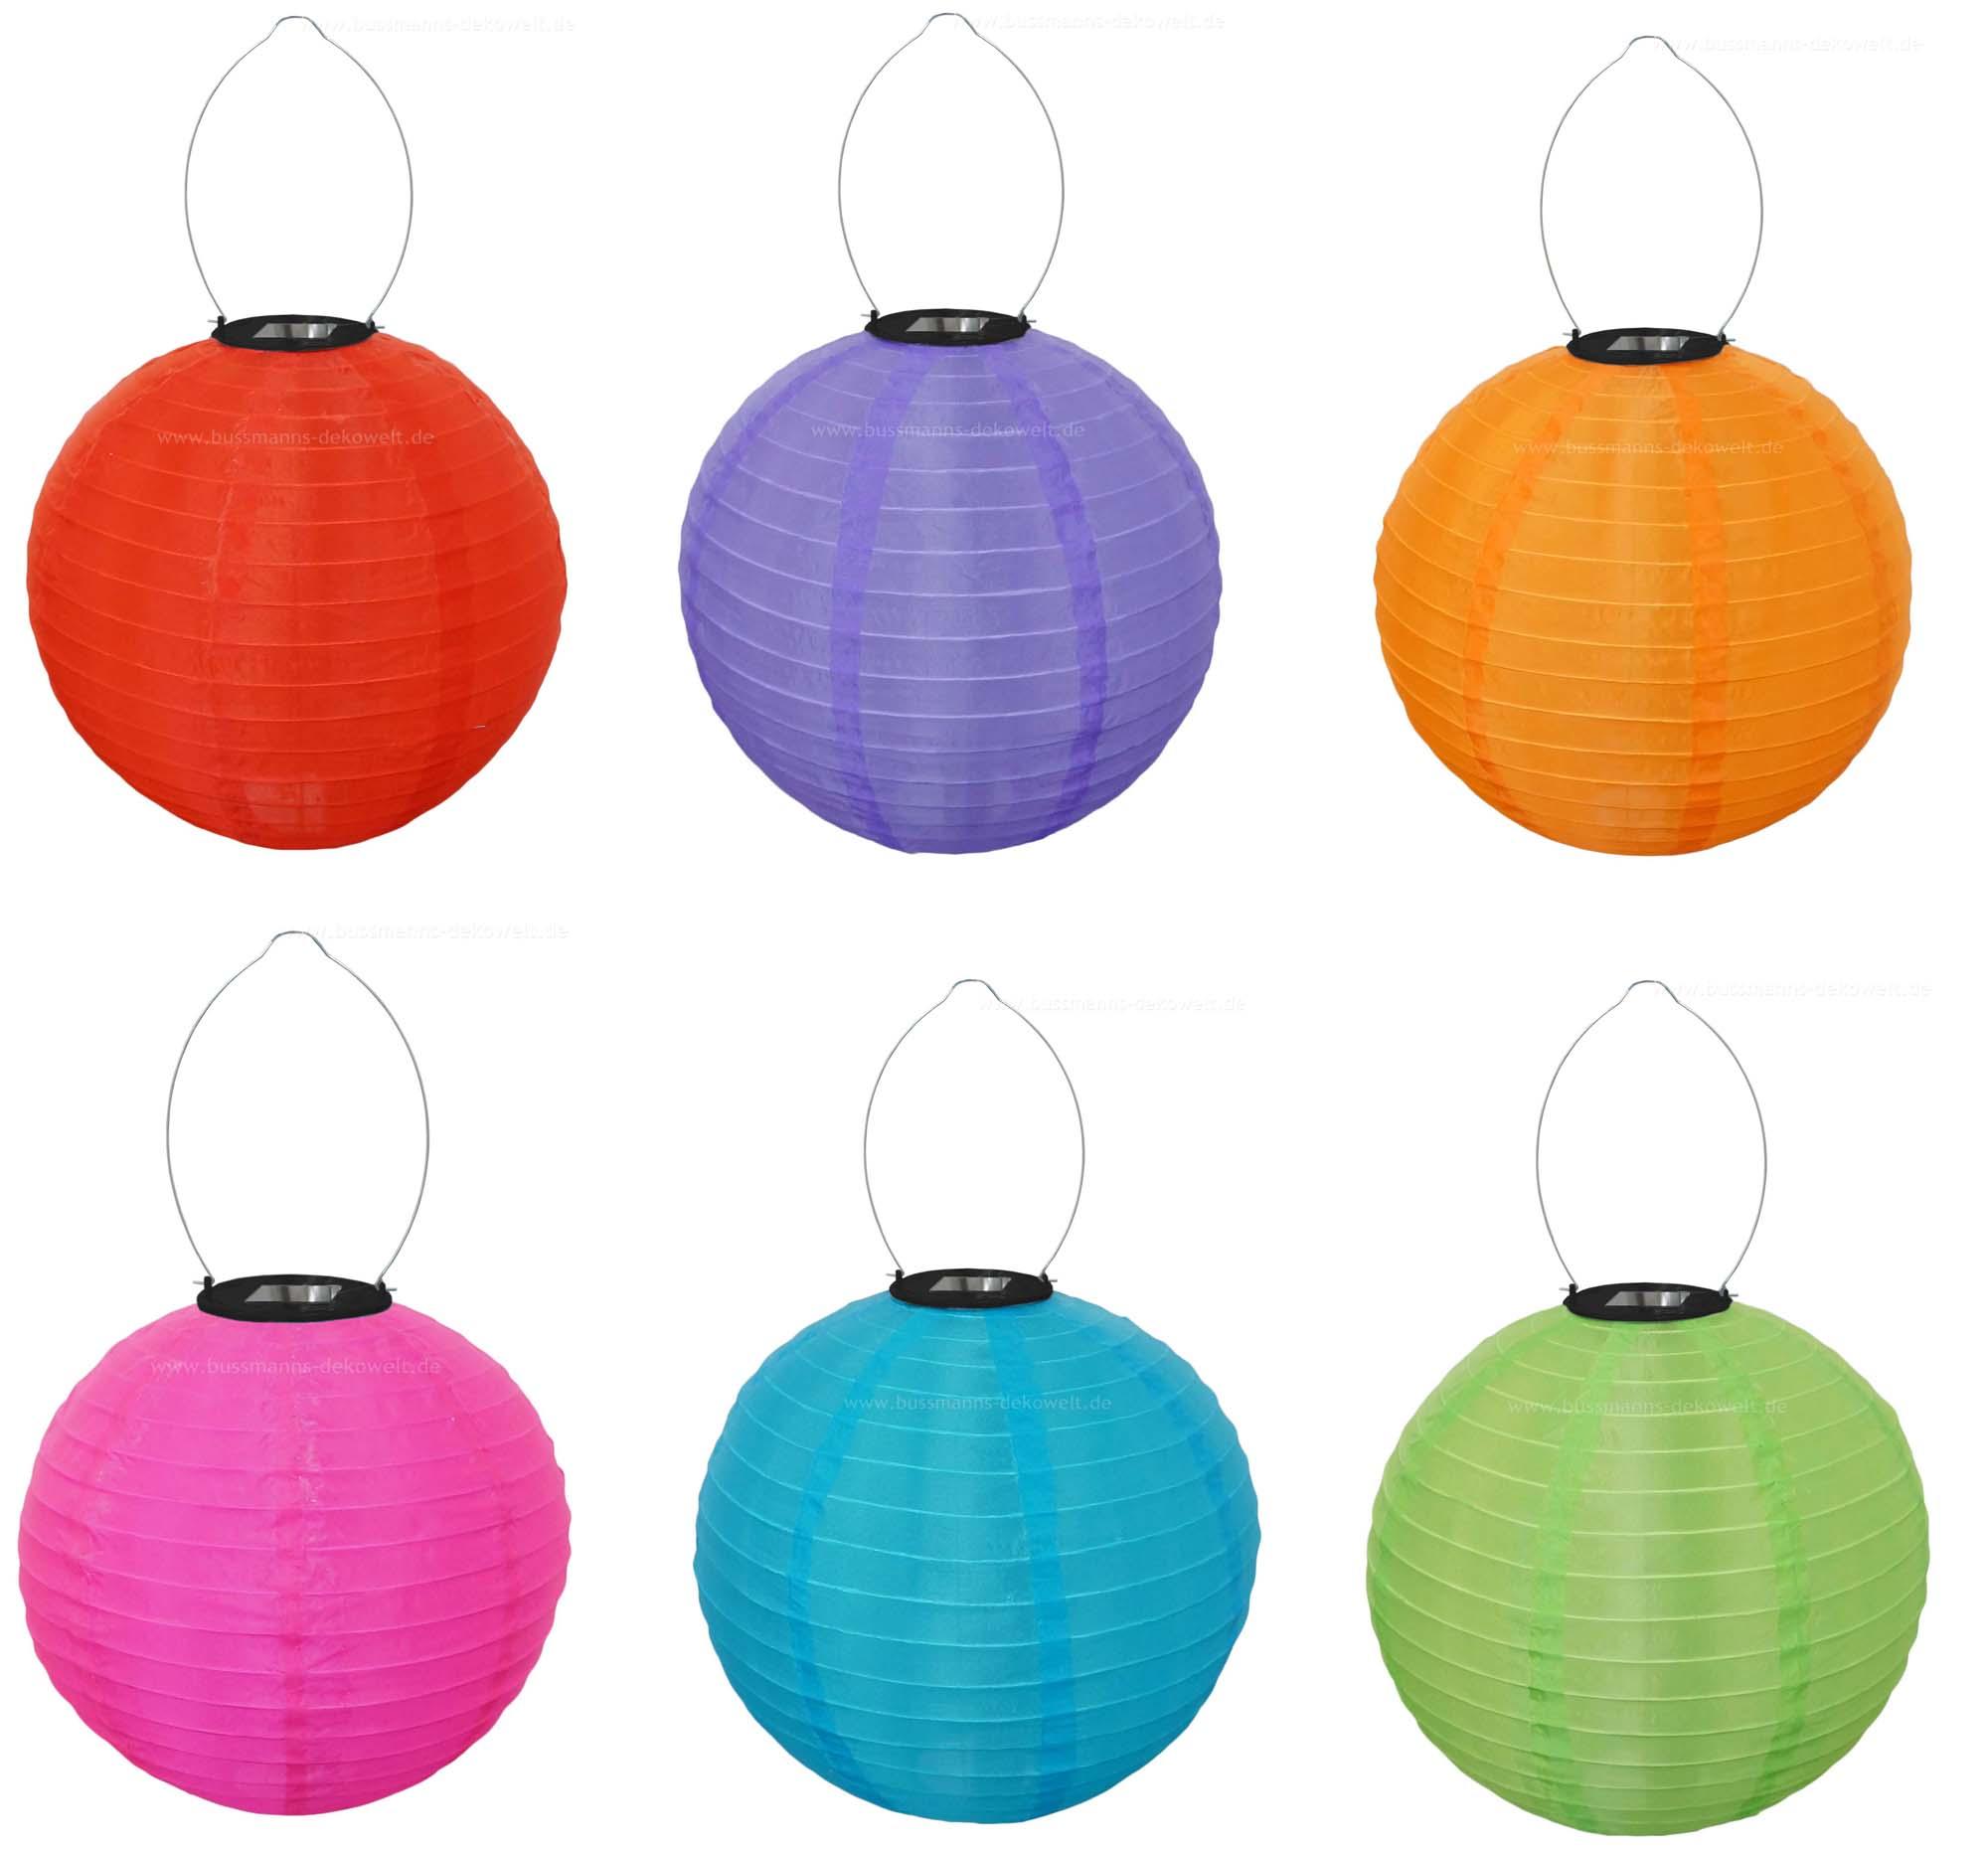 led solar lampion bunt rund 30 cm lampions solarlampion ebay. Black Bedroom Furniture Sets. Home Design Ideas